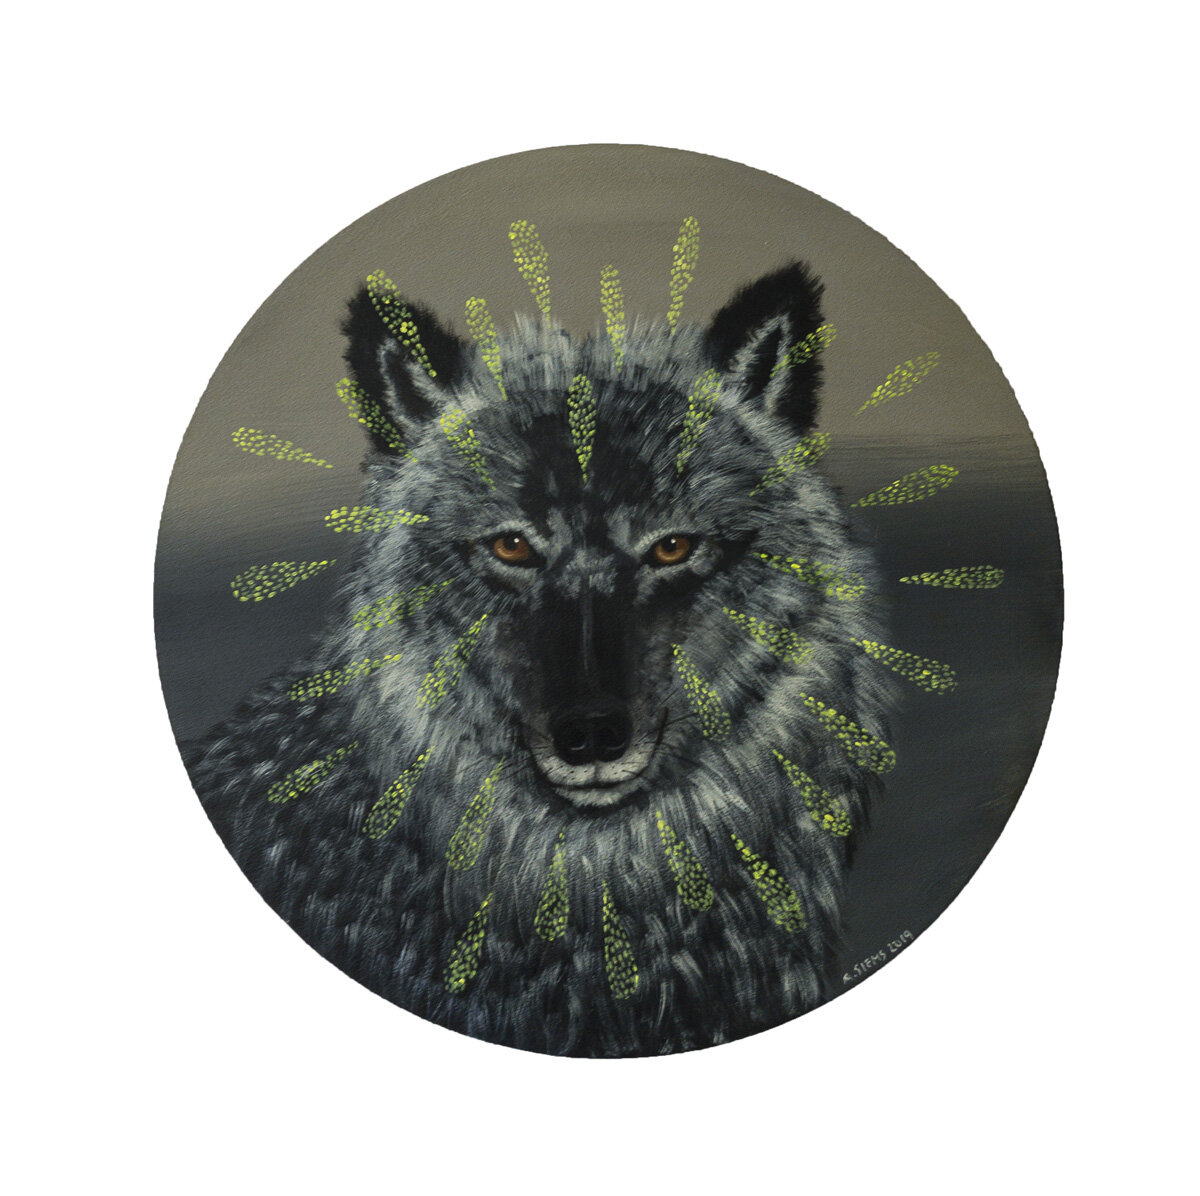 "WISE WOLF, Acrylic on Panel, 18"" diameter"